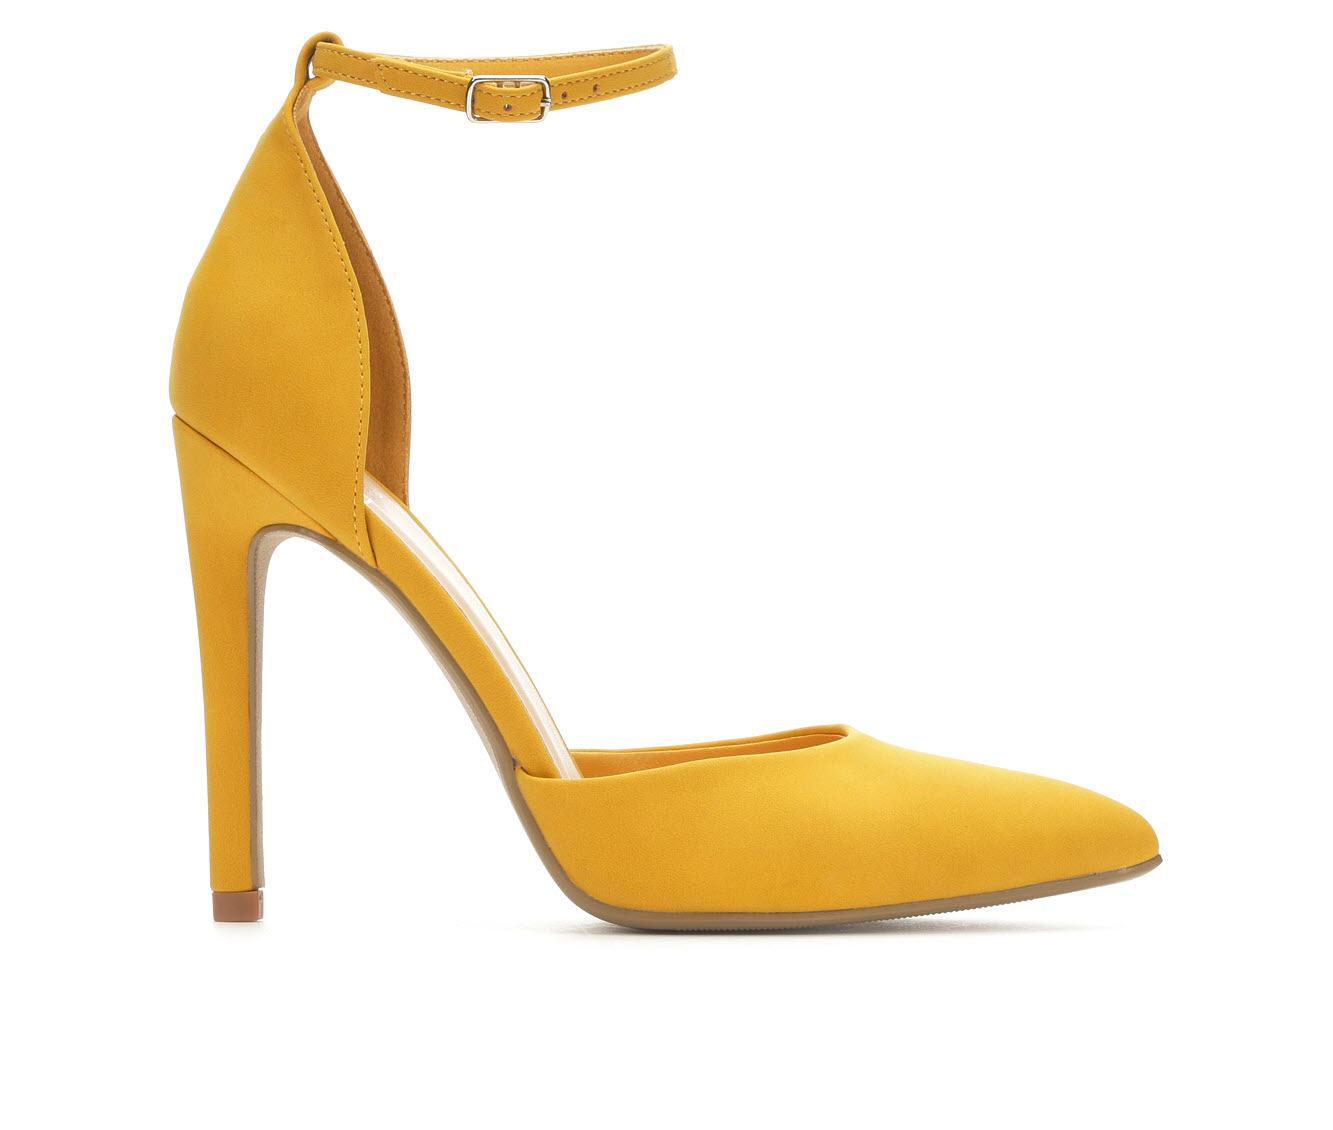 Delicious Unload Women's Dress Shoe (Yellow Faux Leather)